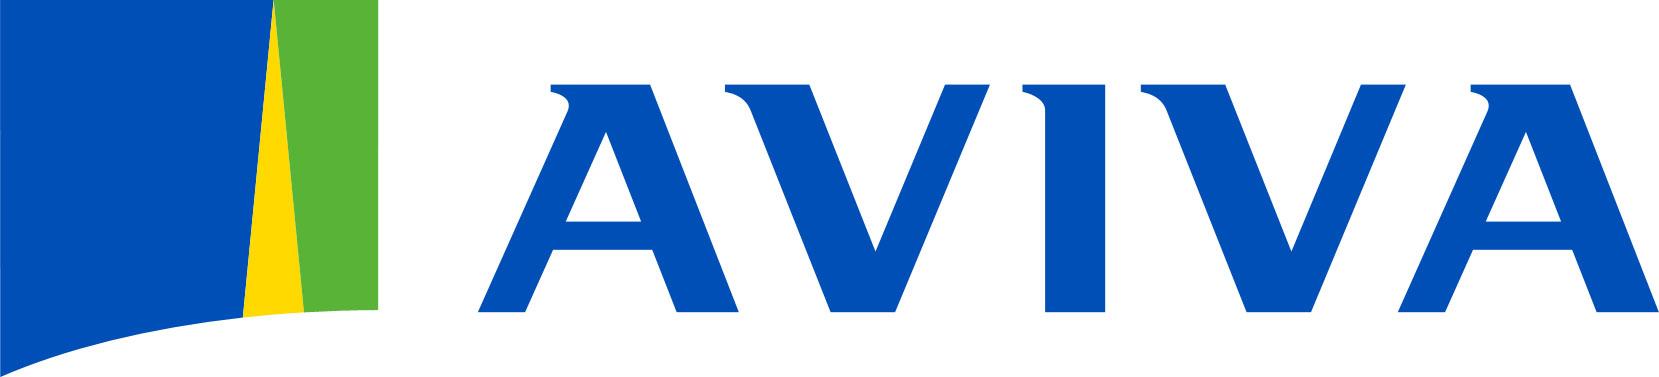 Resultado de imagen de AVIVA